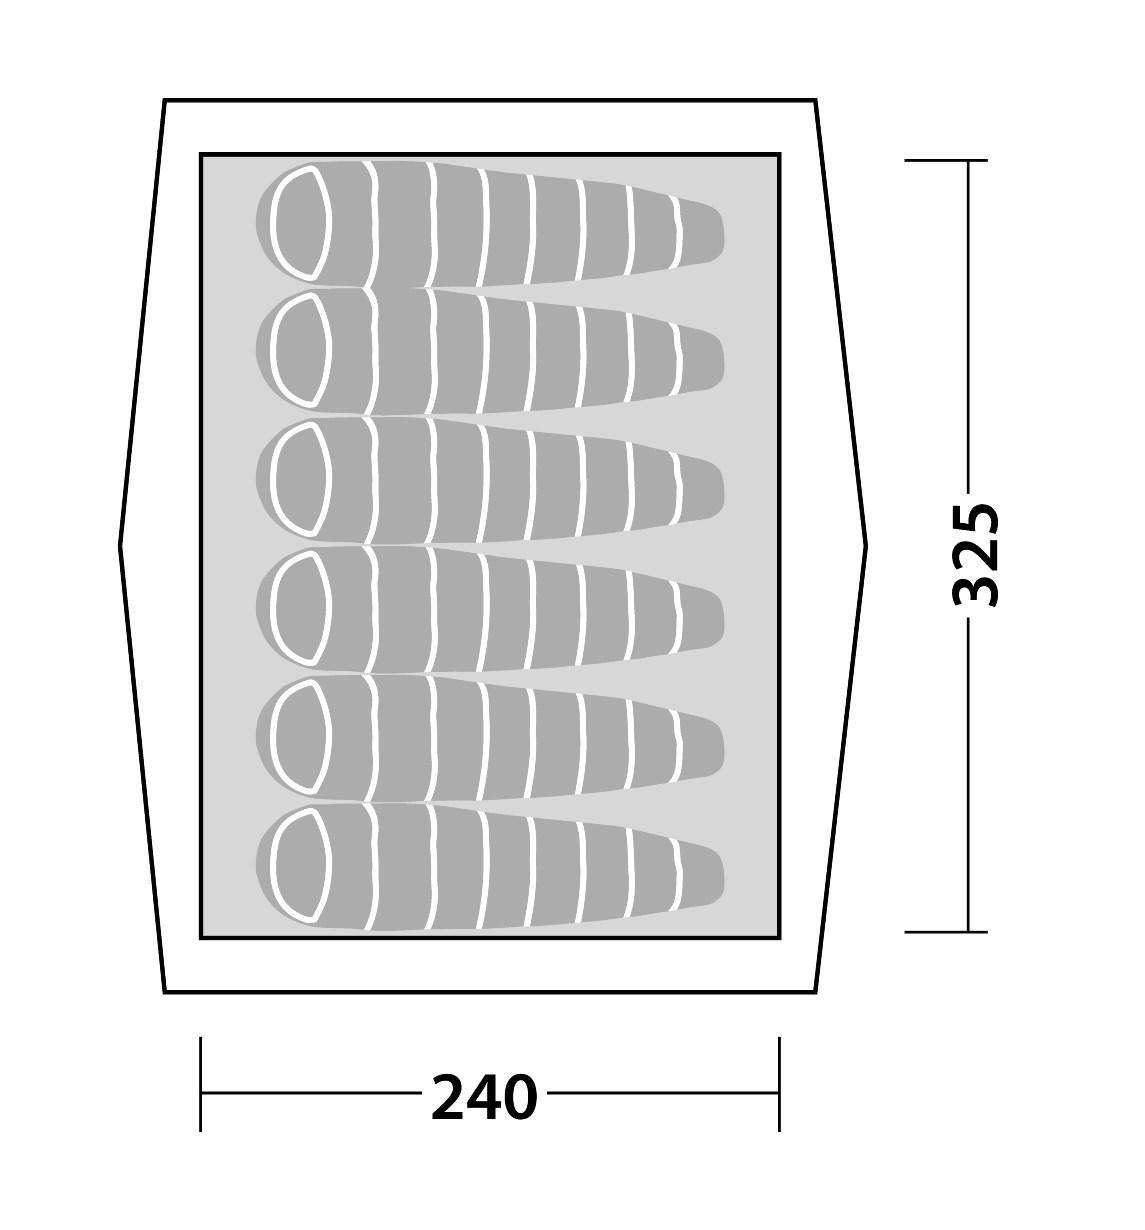 130175_Prospector Shack_Drawing Floorpla